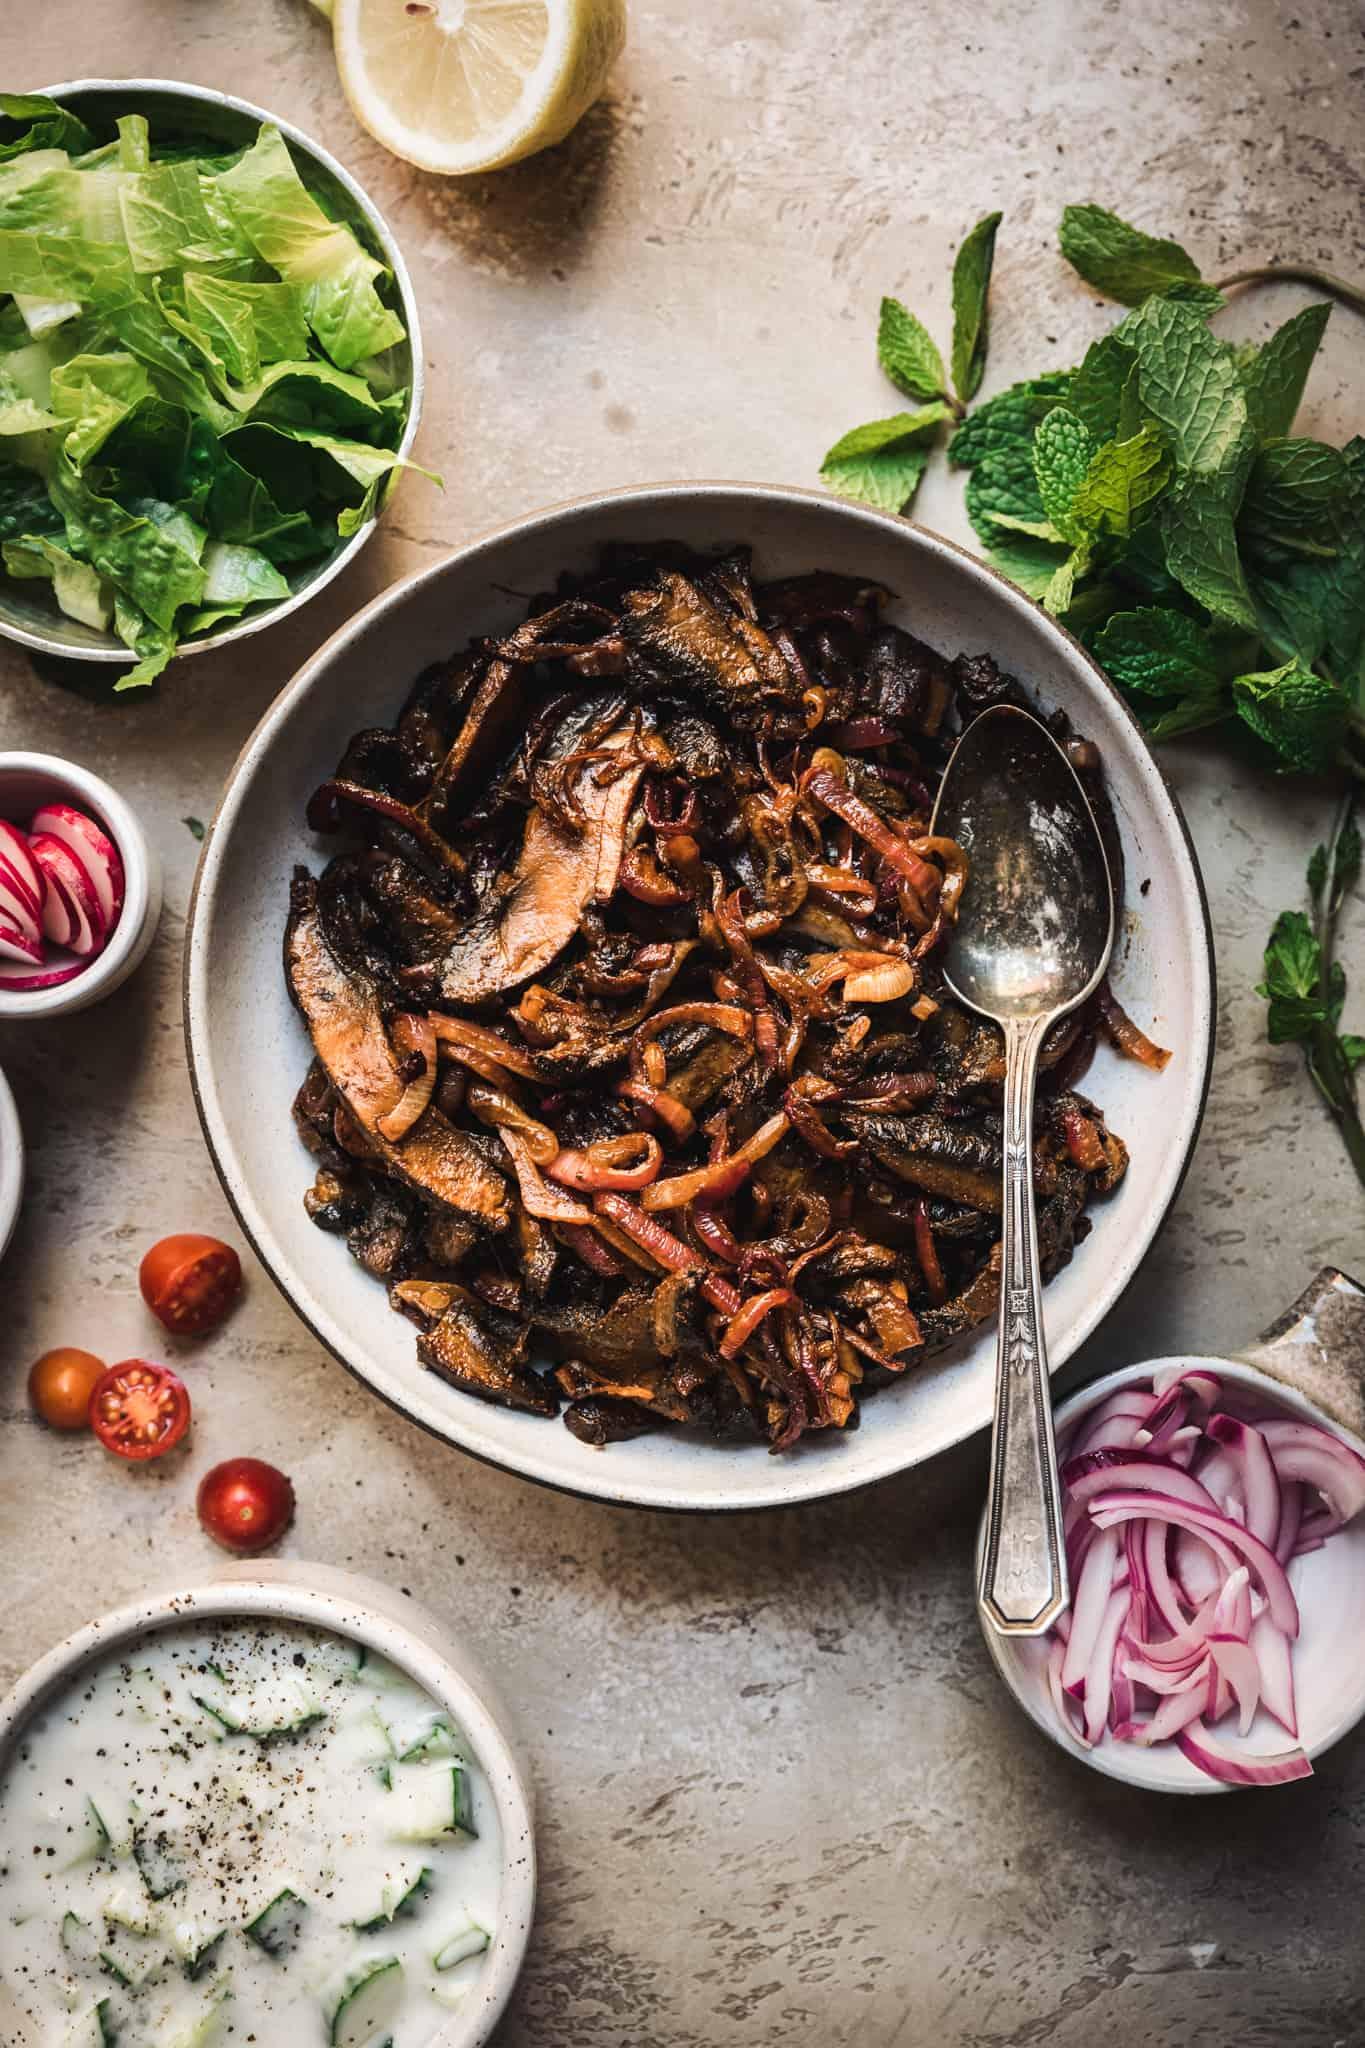 cooked vegan mushroom shawarma with seasoning in a bowl